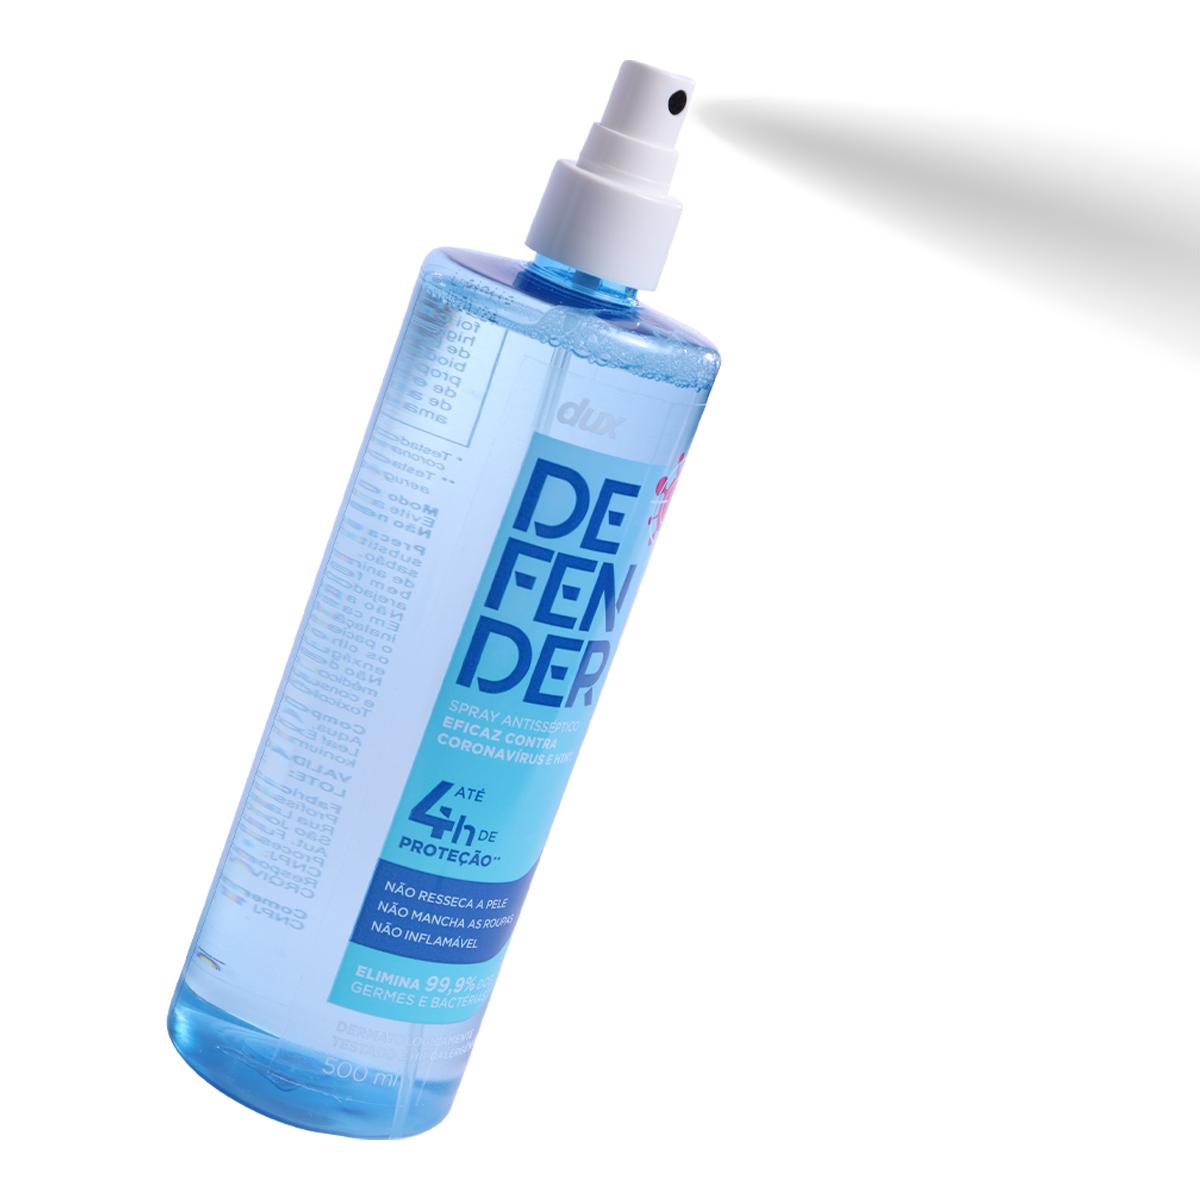 Kit 2 Unidades Dux Defender Spray 500ml + Dux Defender Dispenser